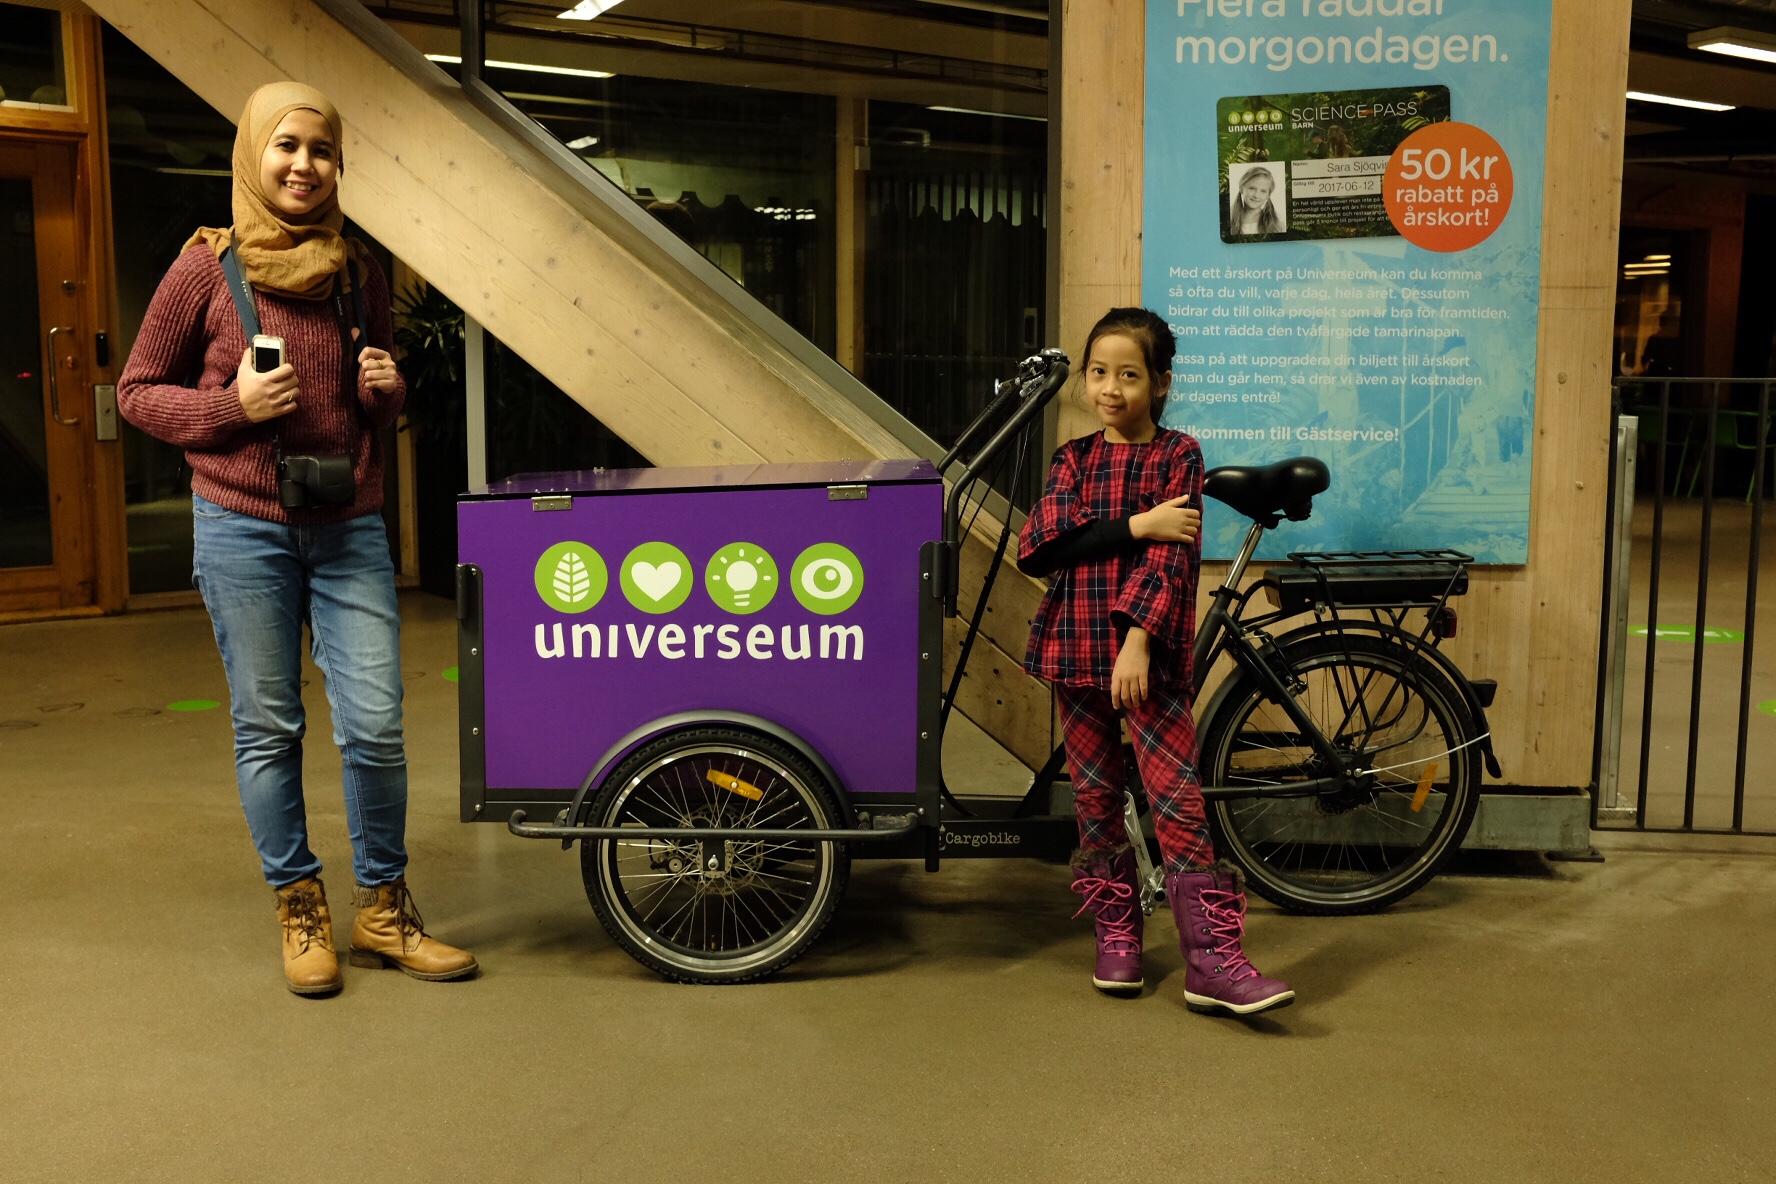 Four Days and Three Nights in Gothenburg